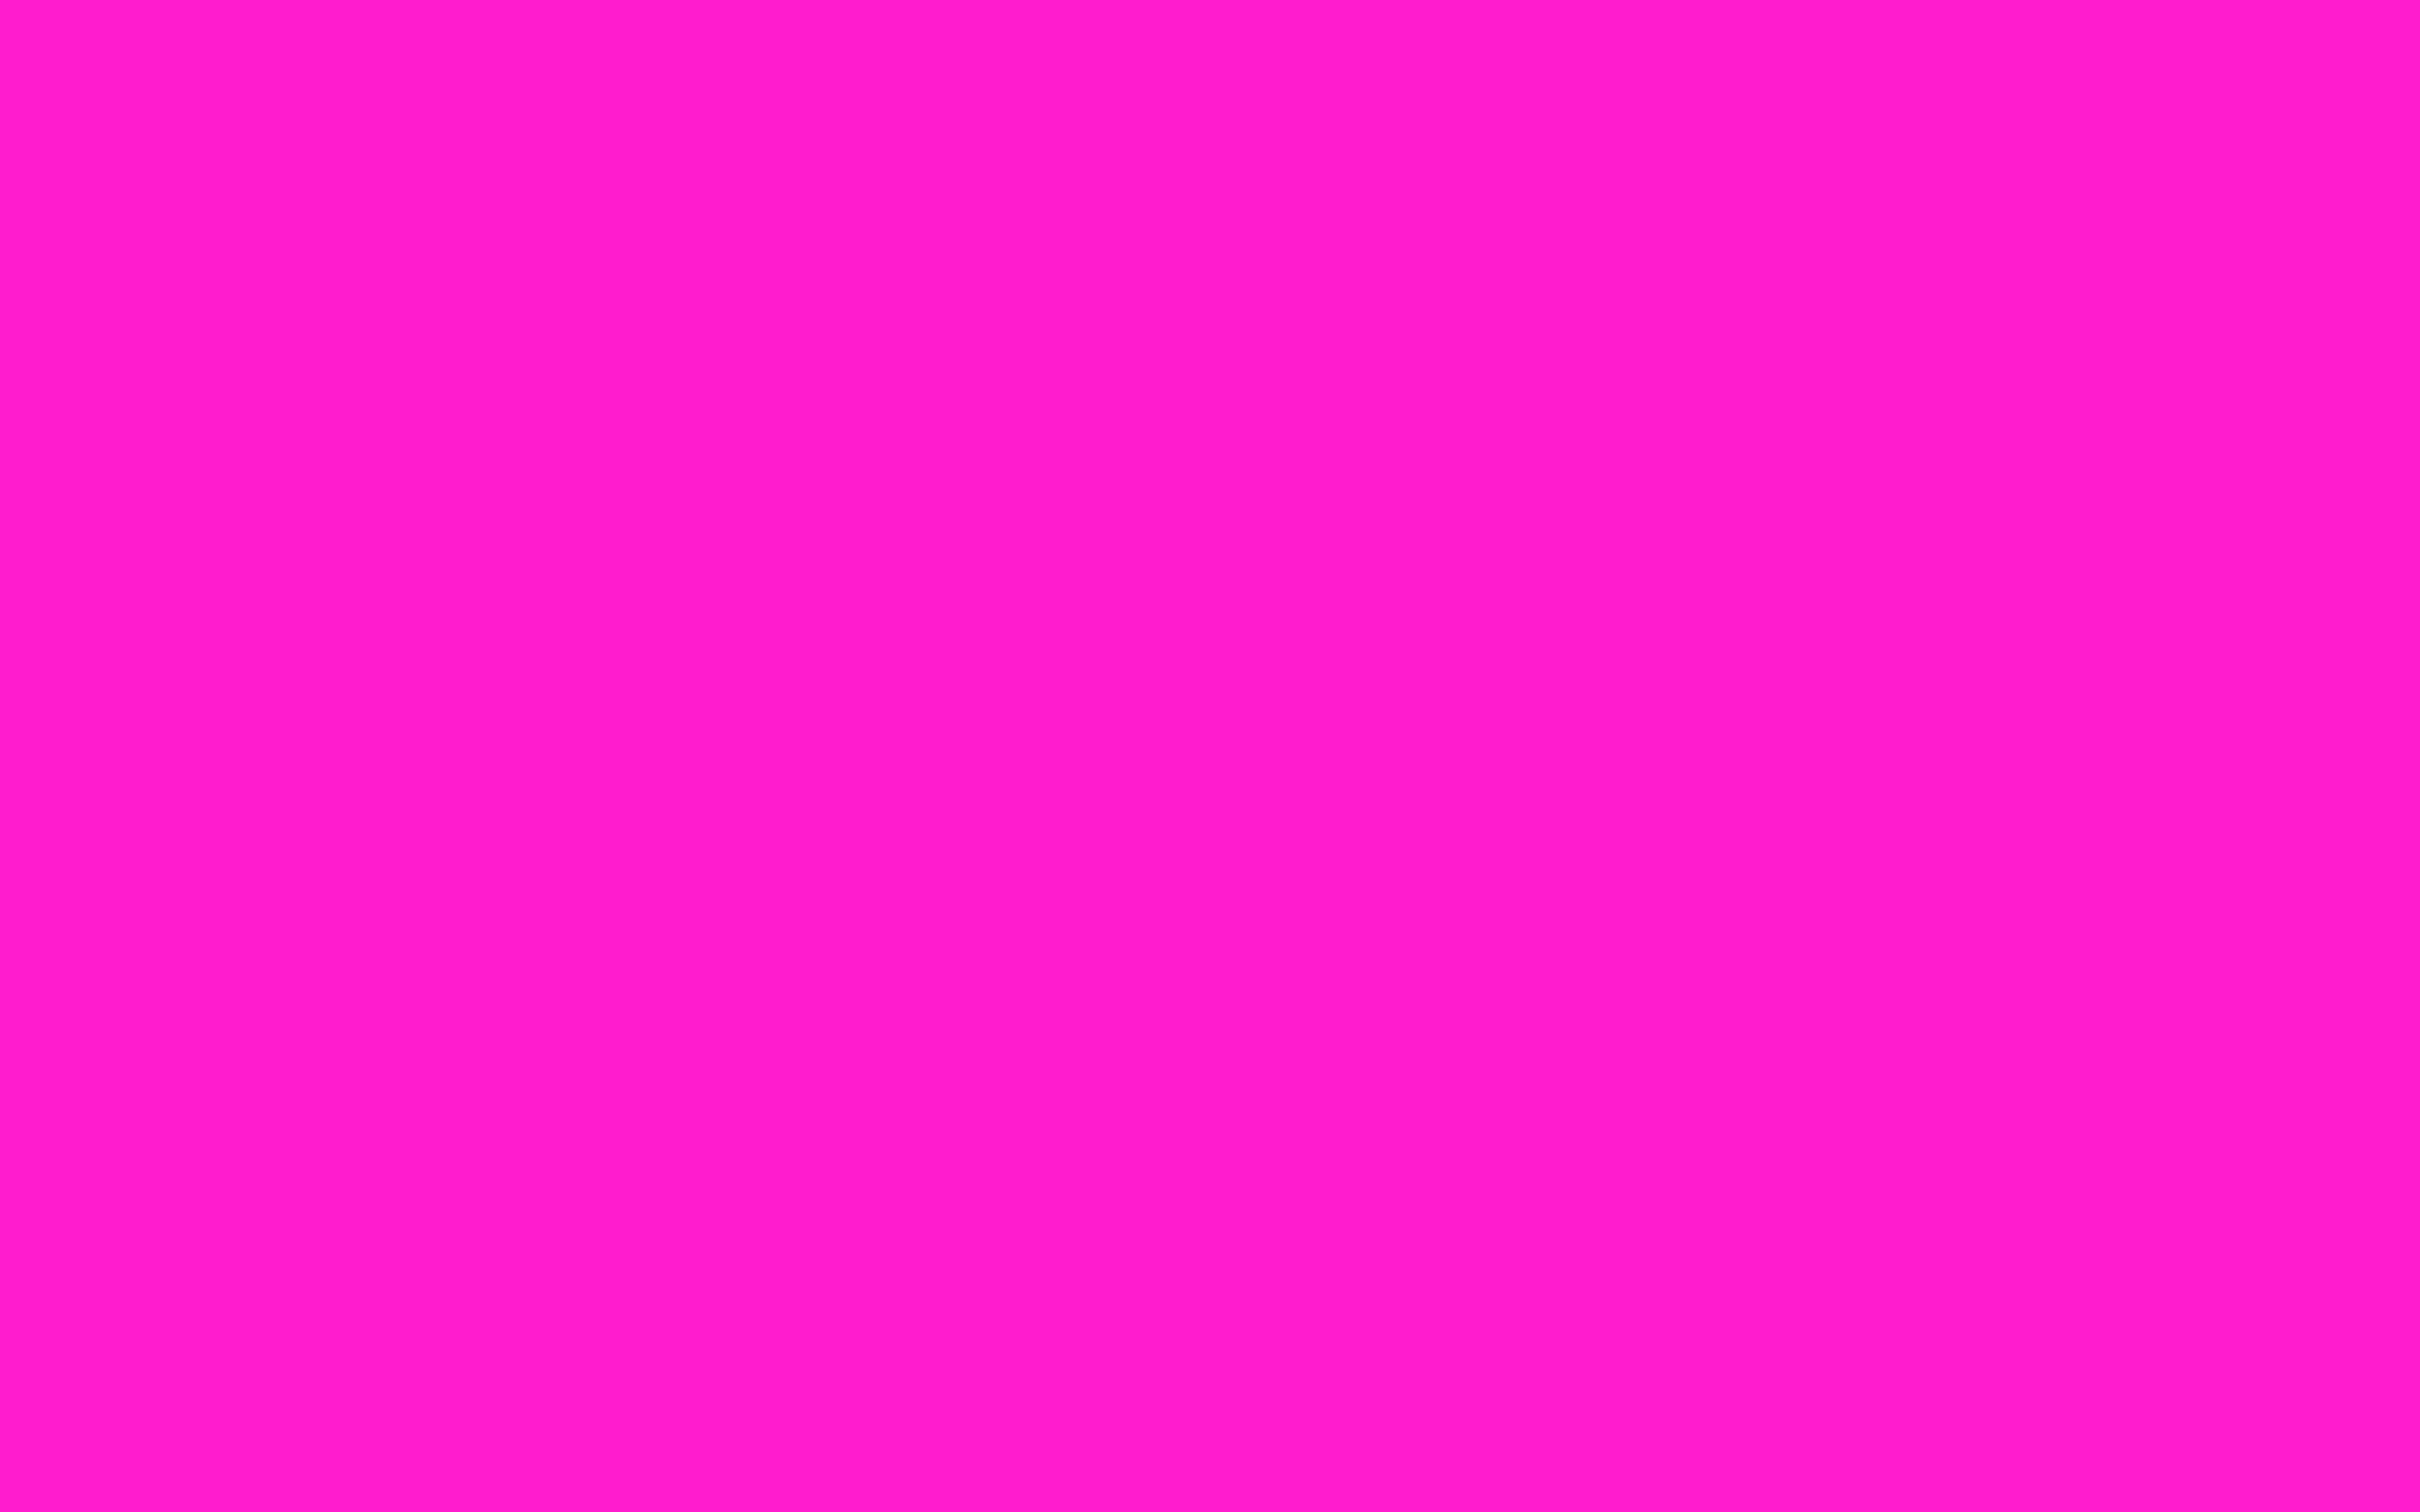 2560x1600 Hot Magenta Solid Color Background